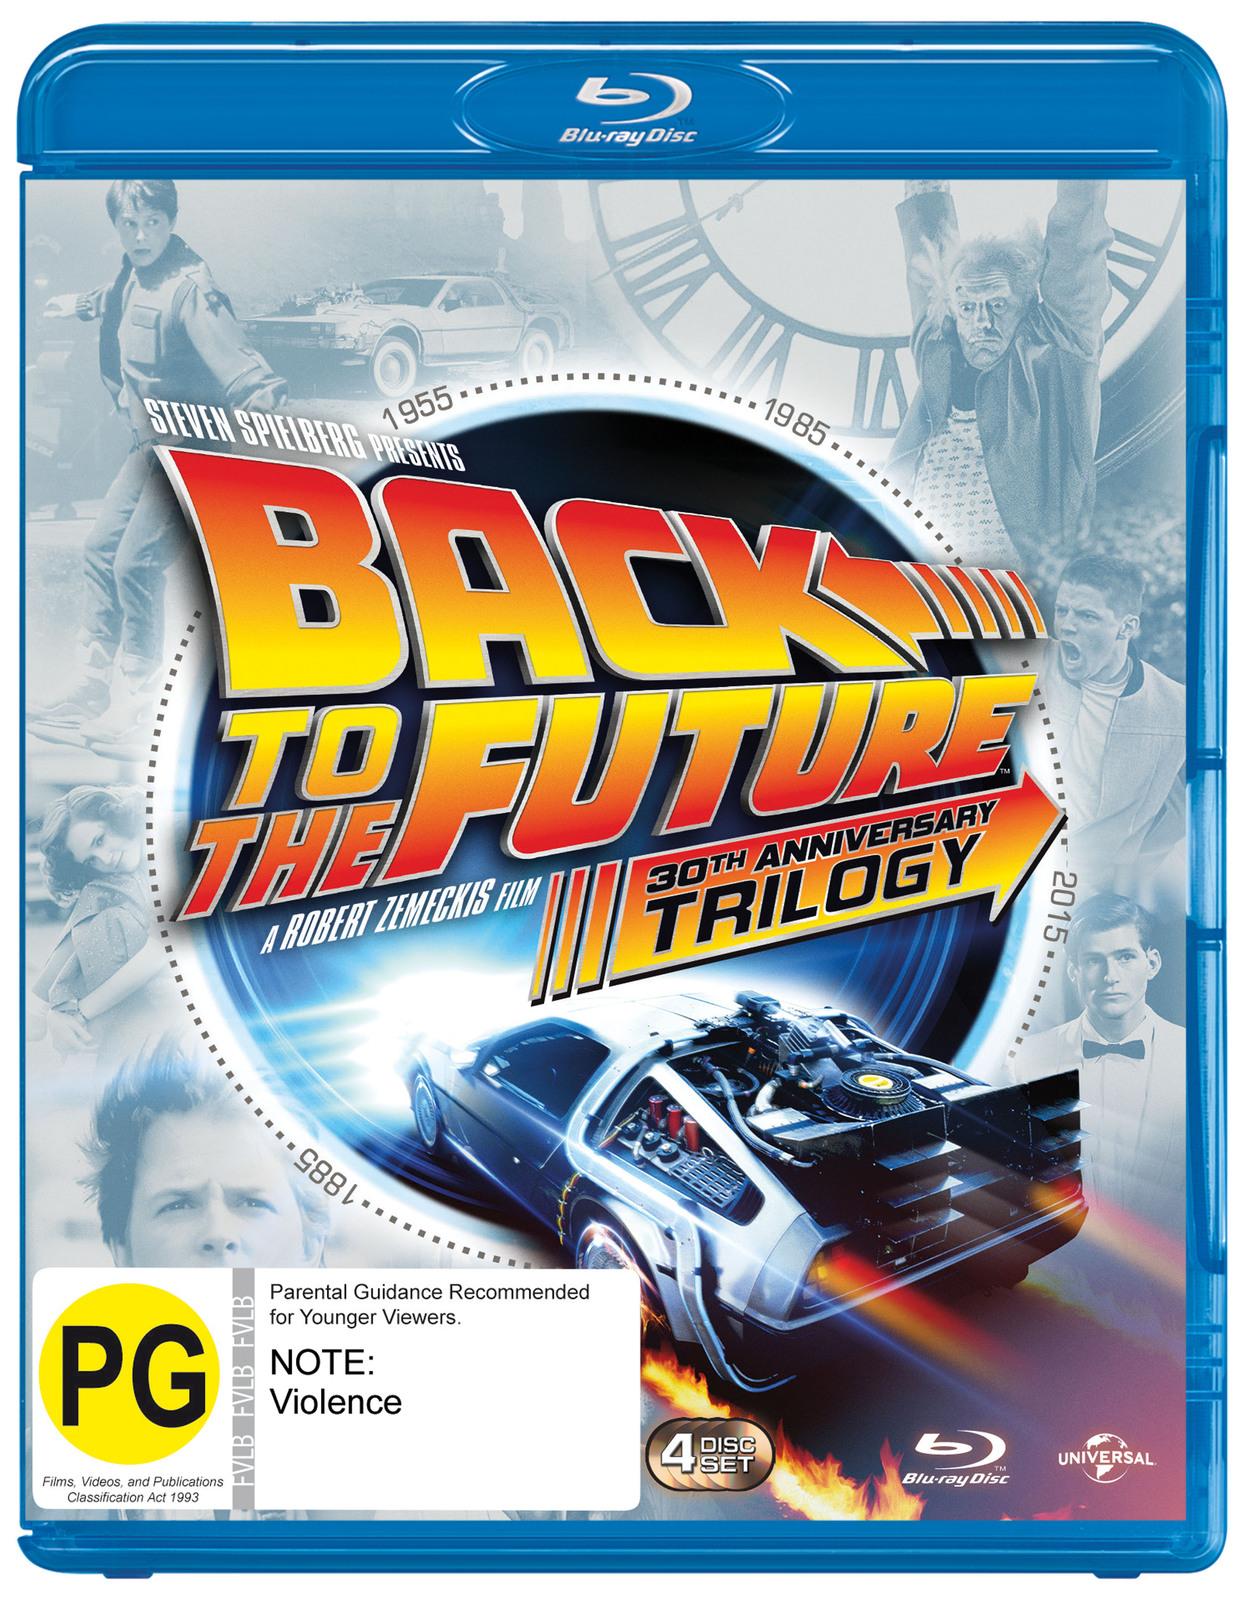 Back To The Future Trilogy Set (Bonus Disc) on Blu-ray image